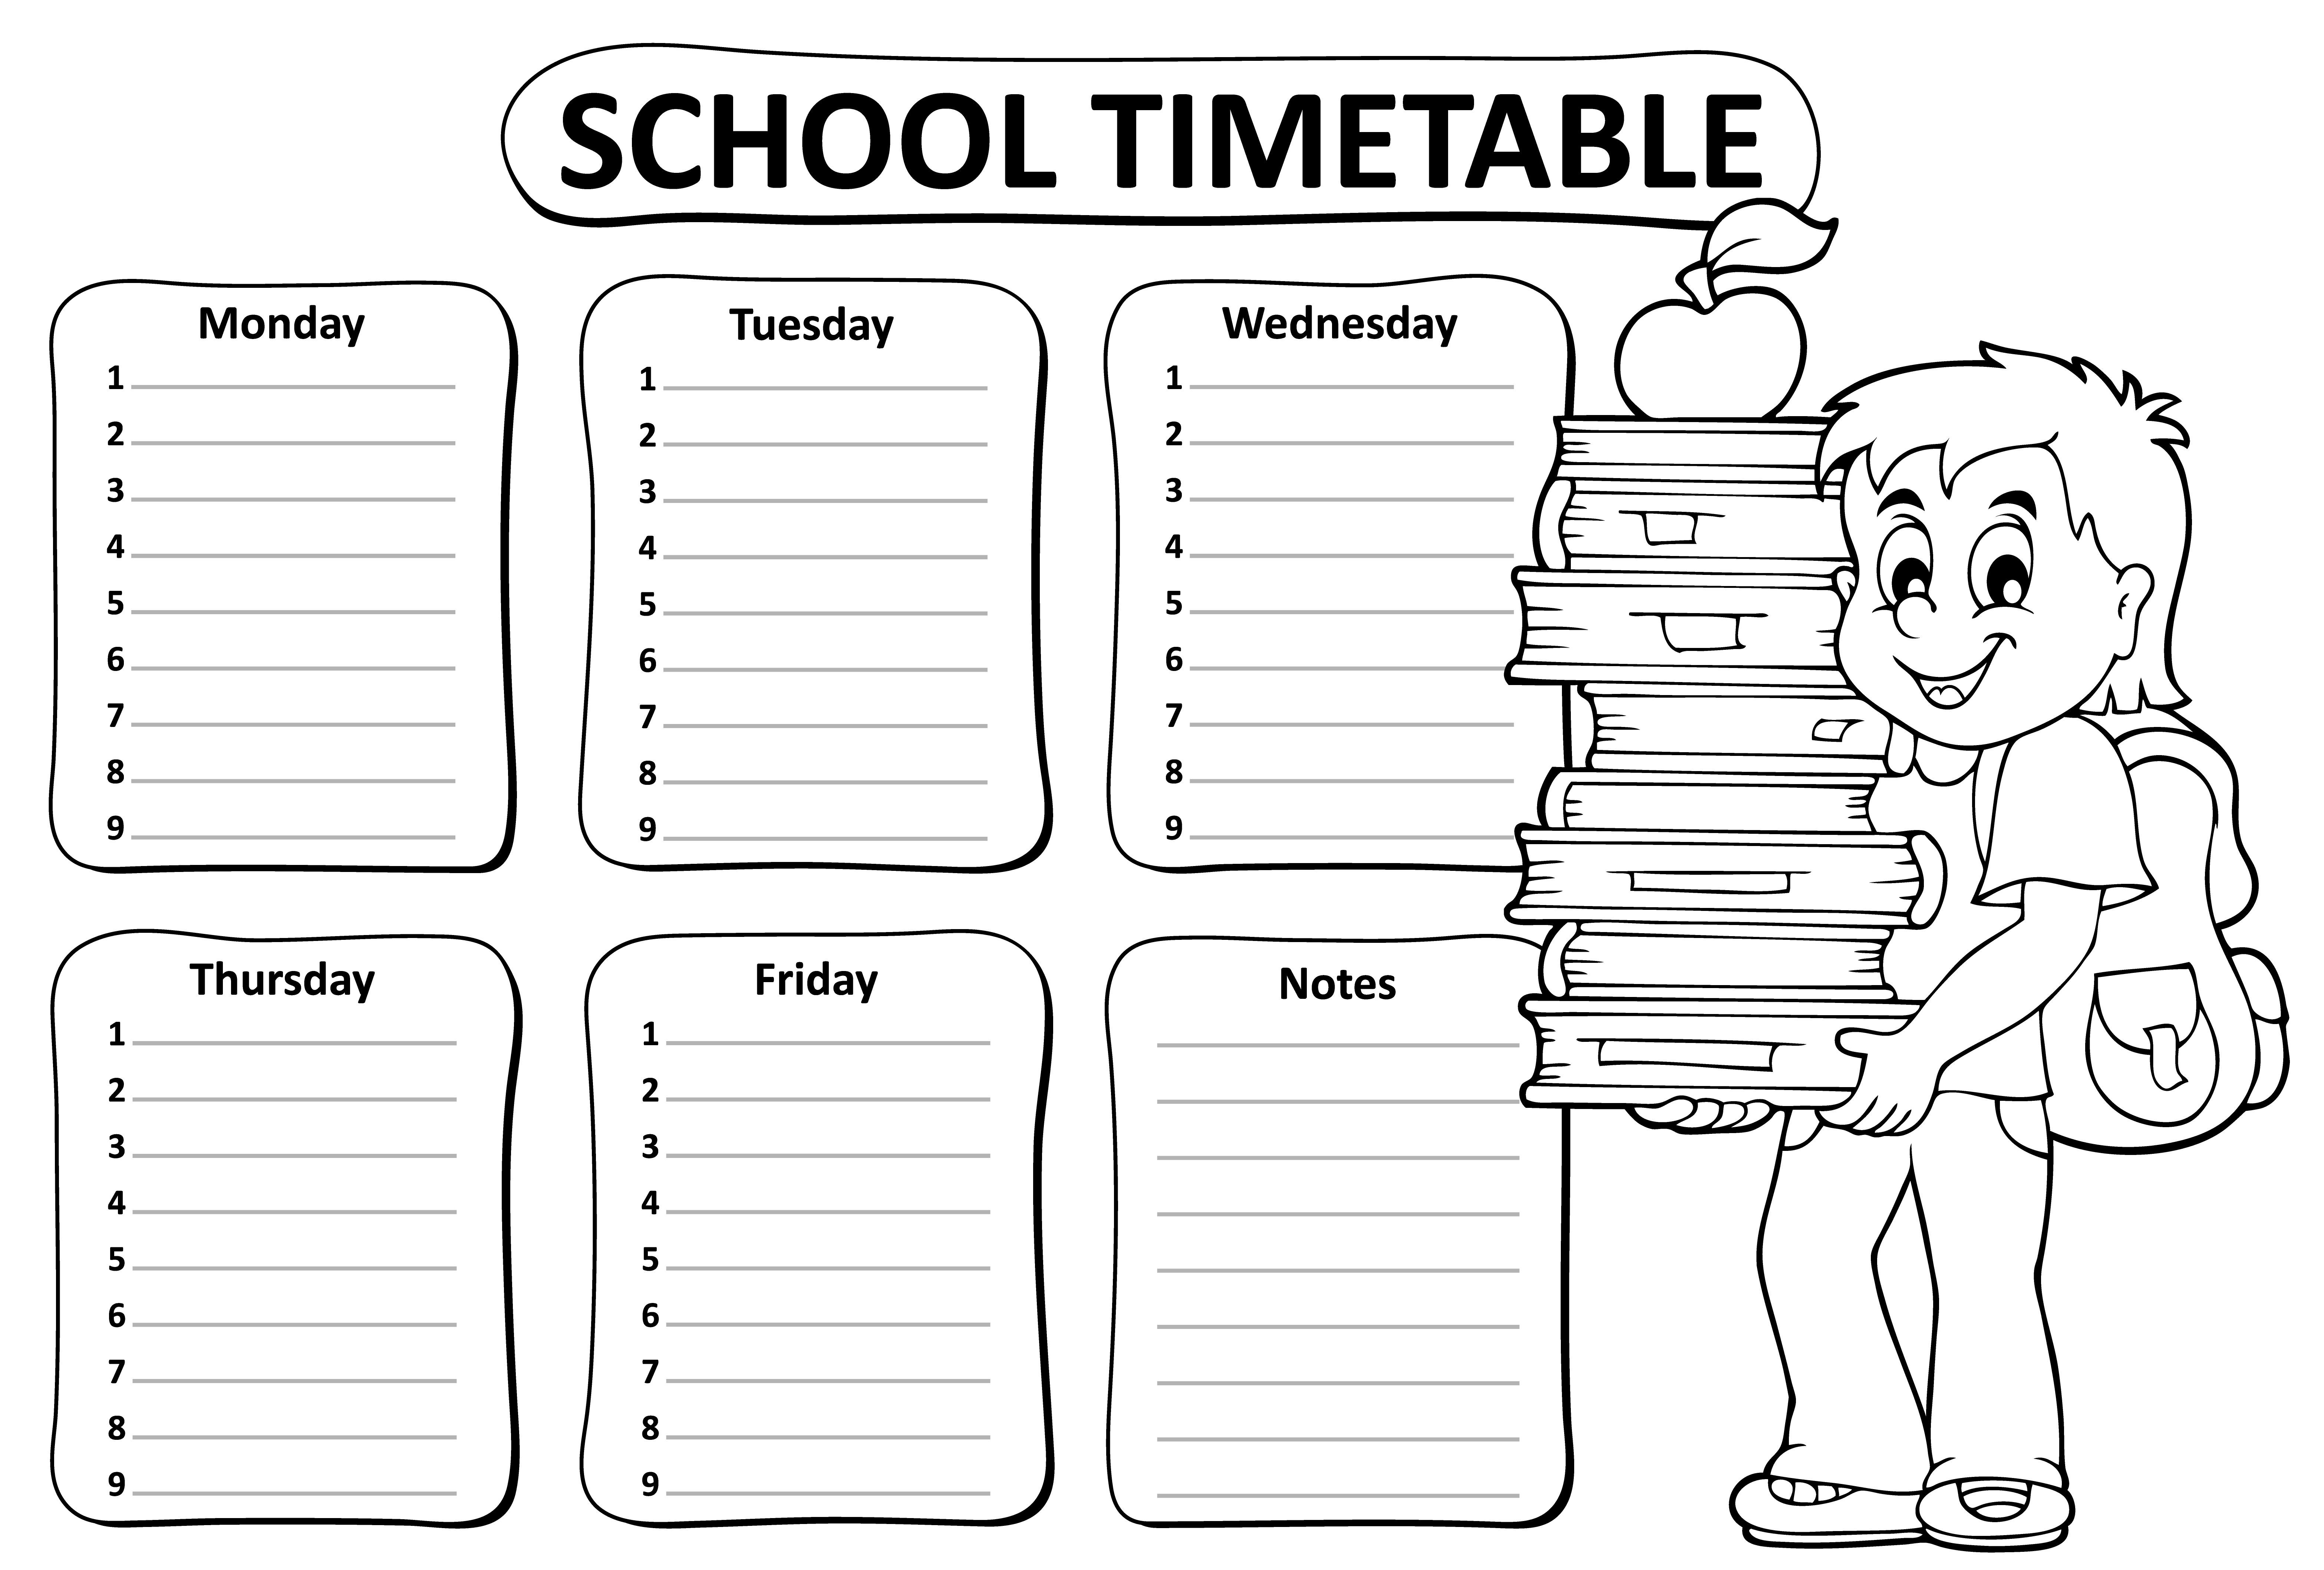 Black and white school timetable theme 2 - eps10 vector illustration.